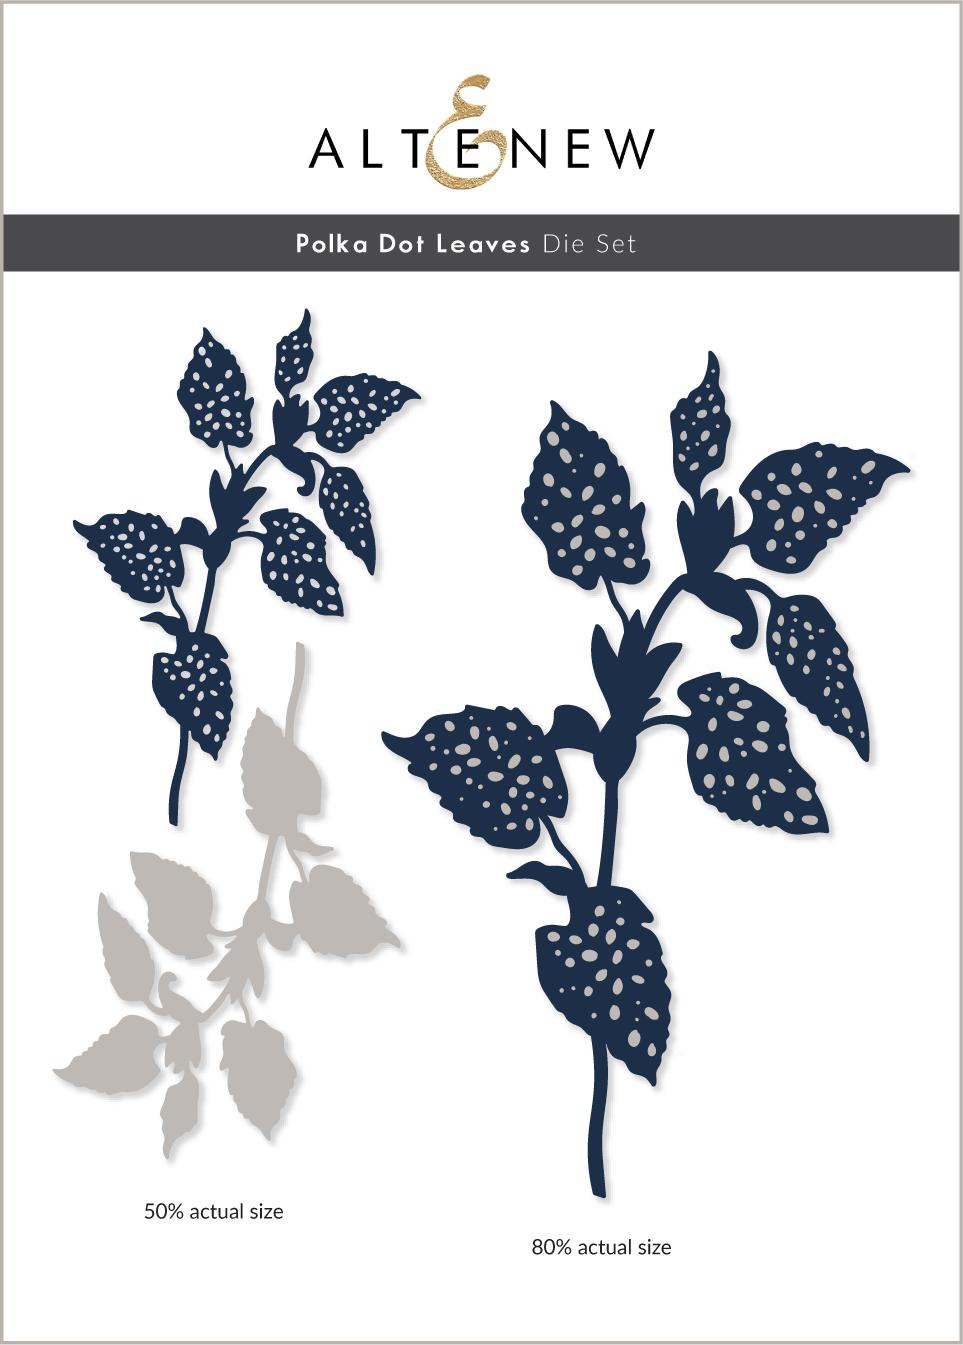 Polka Dot Leaves